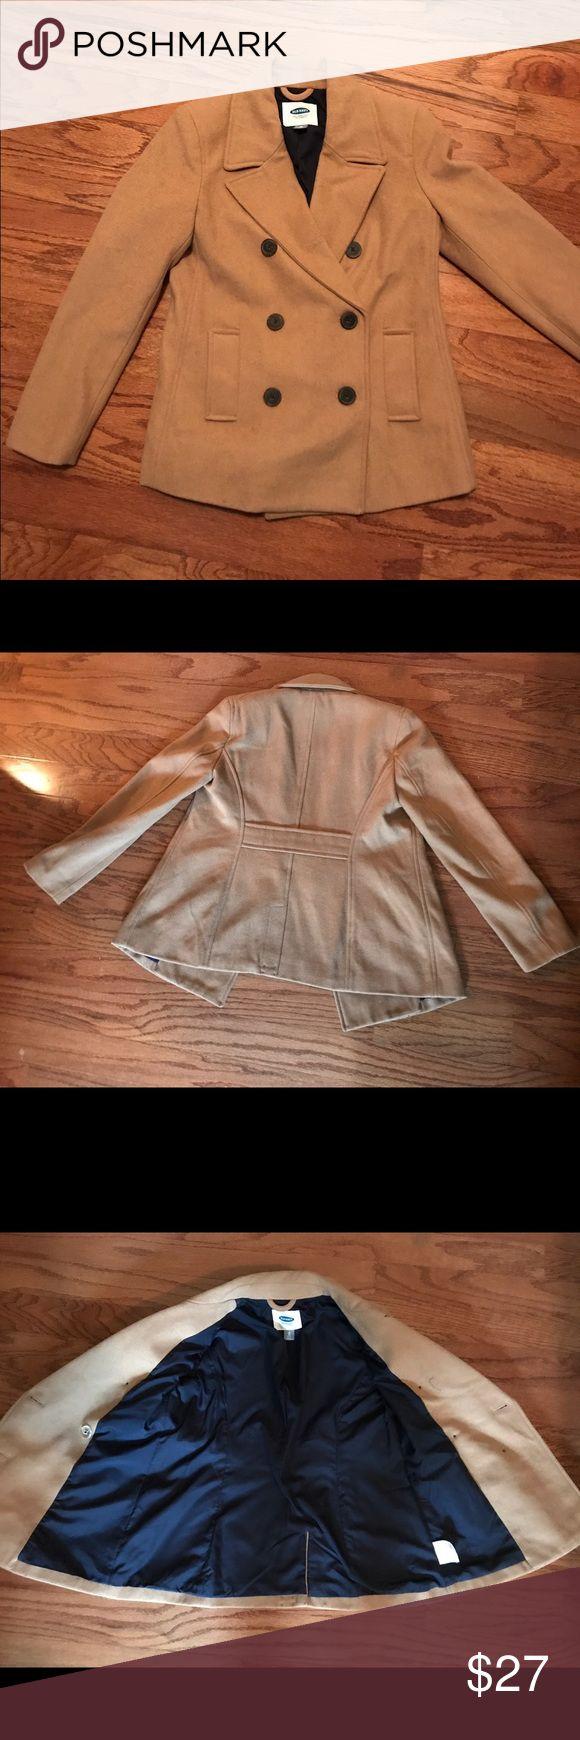 Old Navy pea coat Like new Old Navy camel/tan pea coat with navy interior. Worn once! XS TP(petite) Old Navy Jackets & Coats Pea Coats